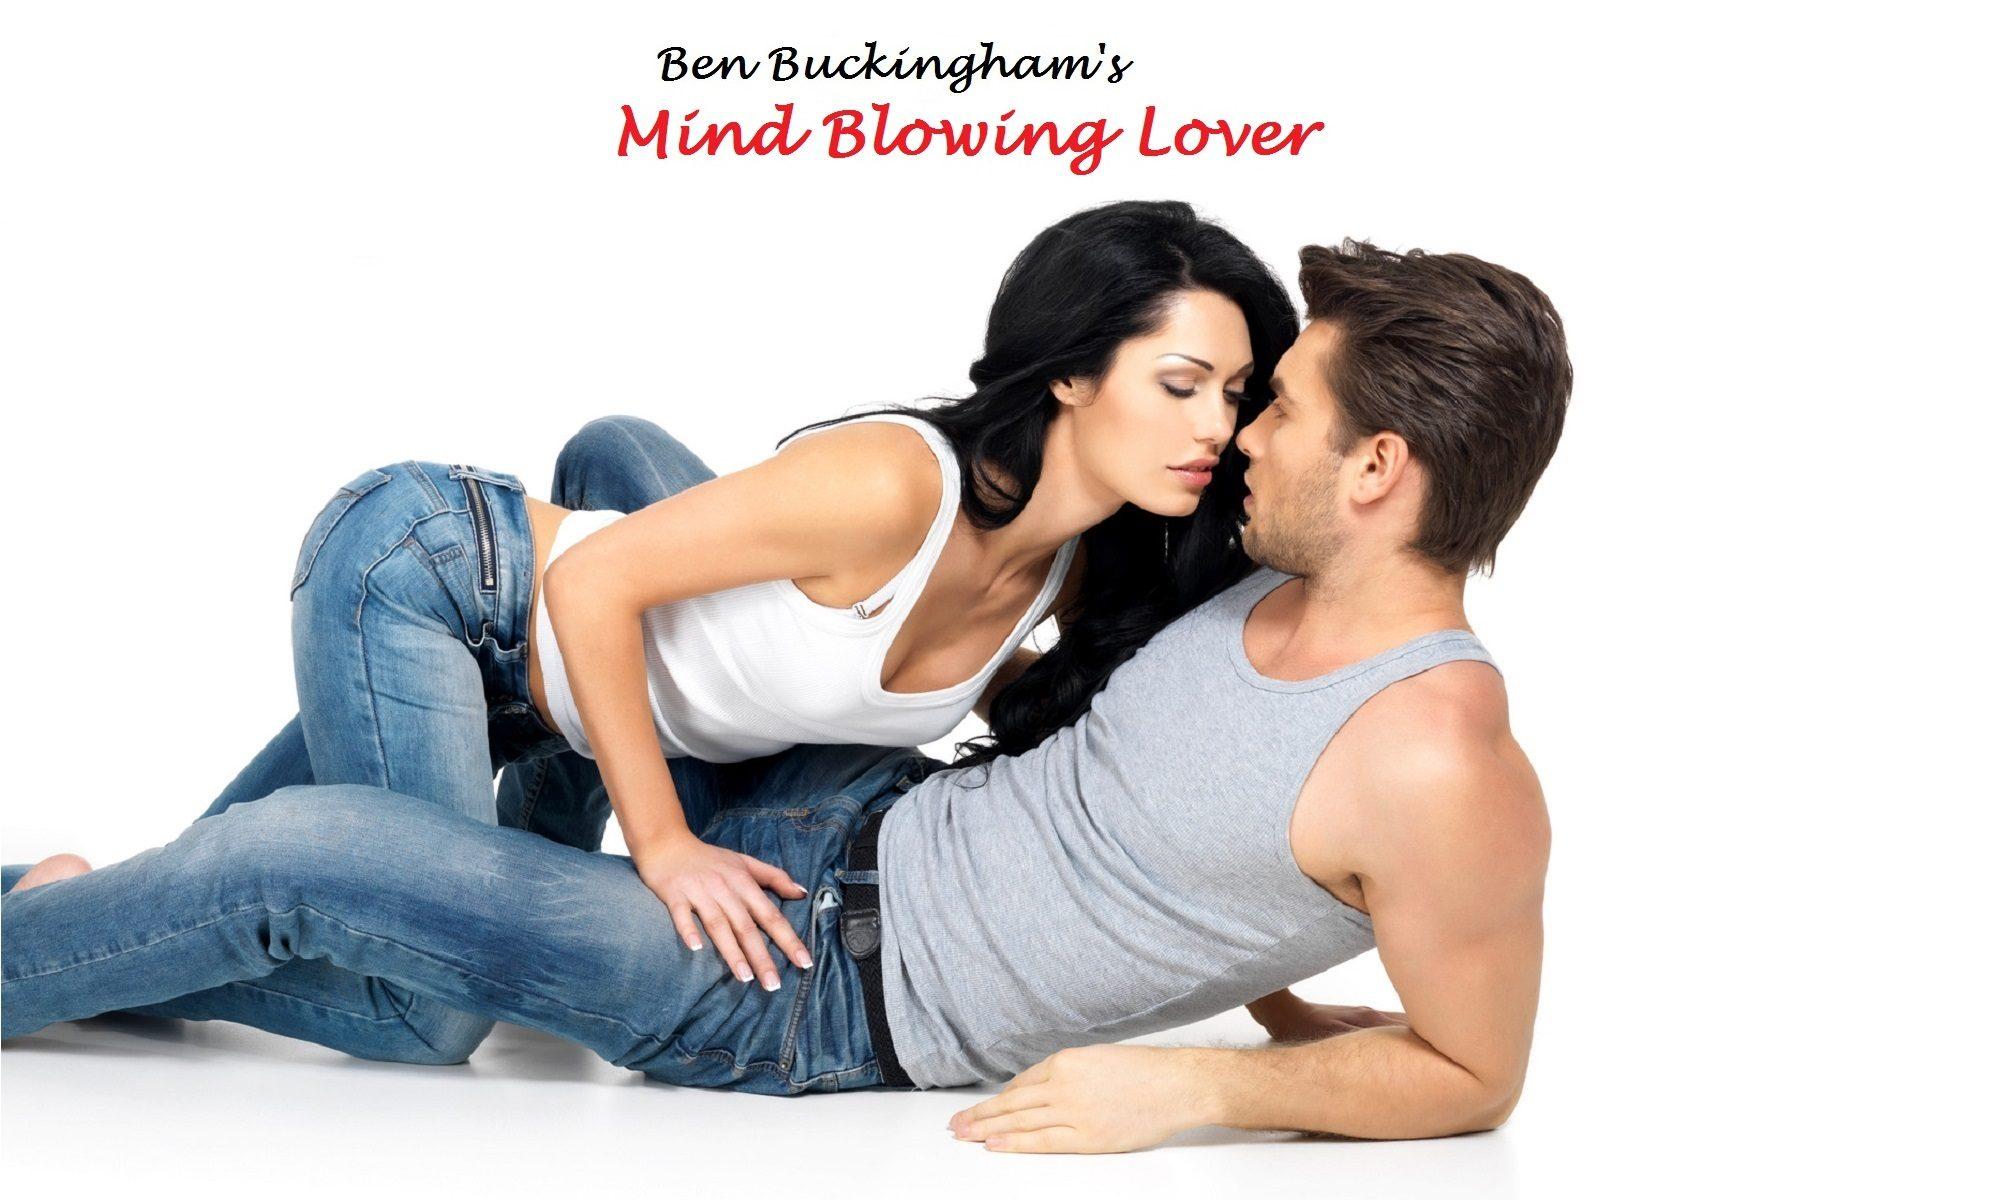 Sex & Orgasm Tutorial Videos & Articles